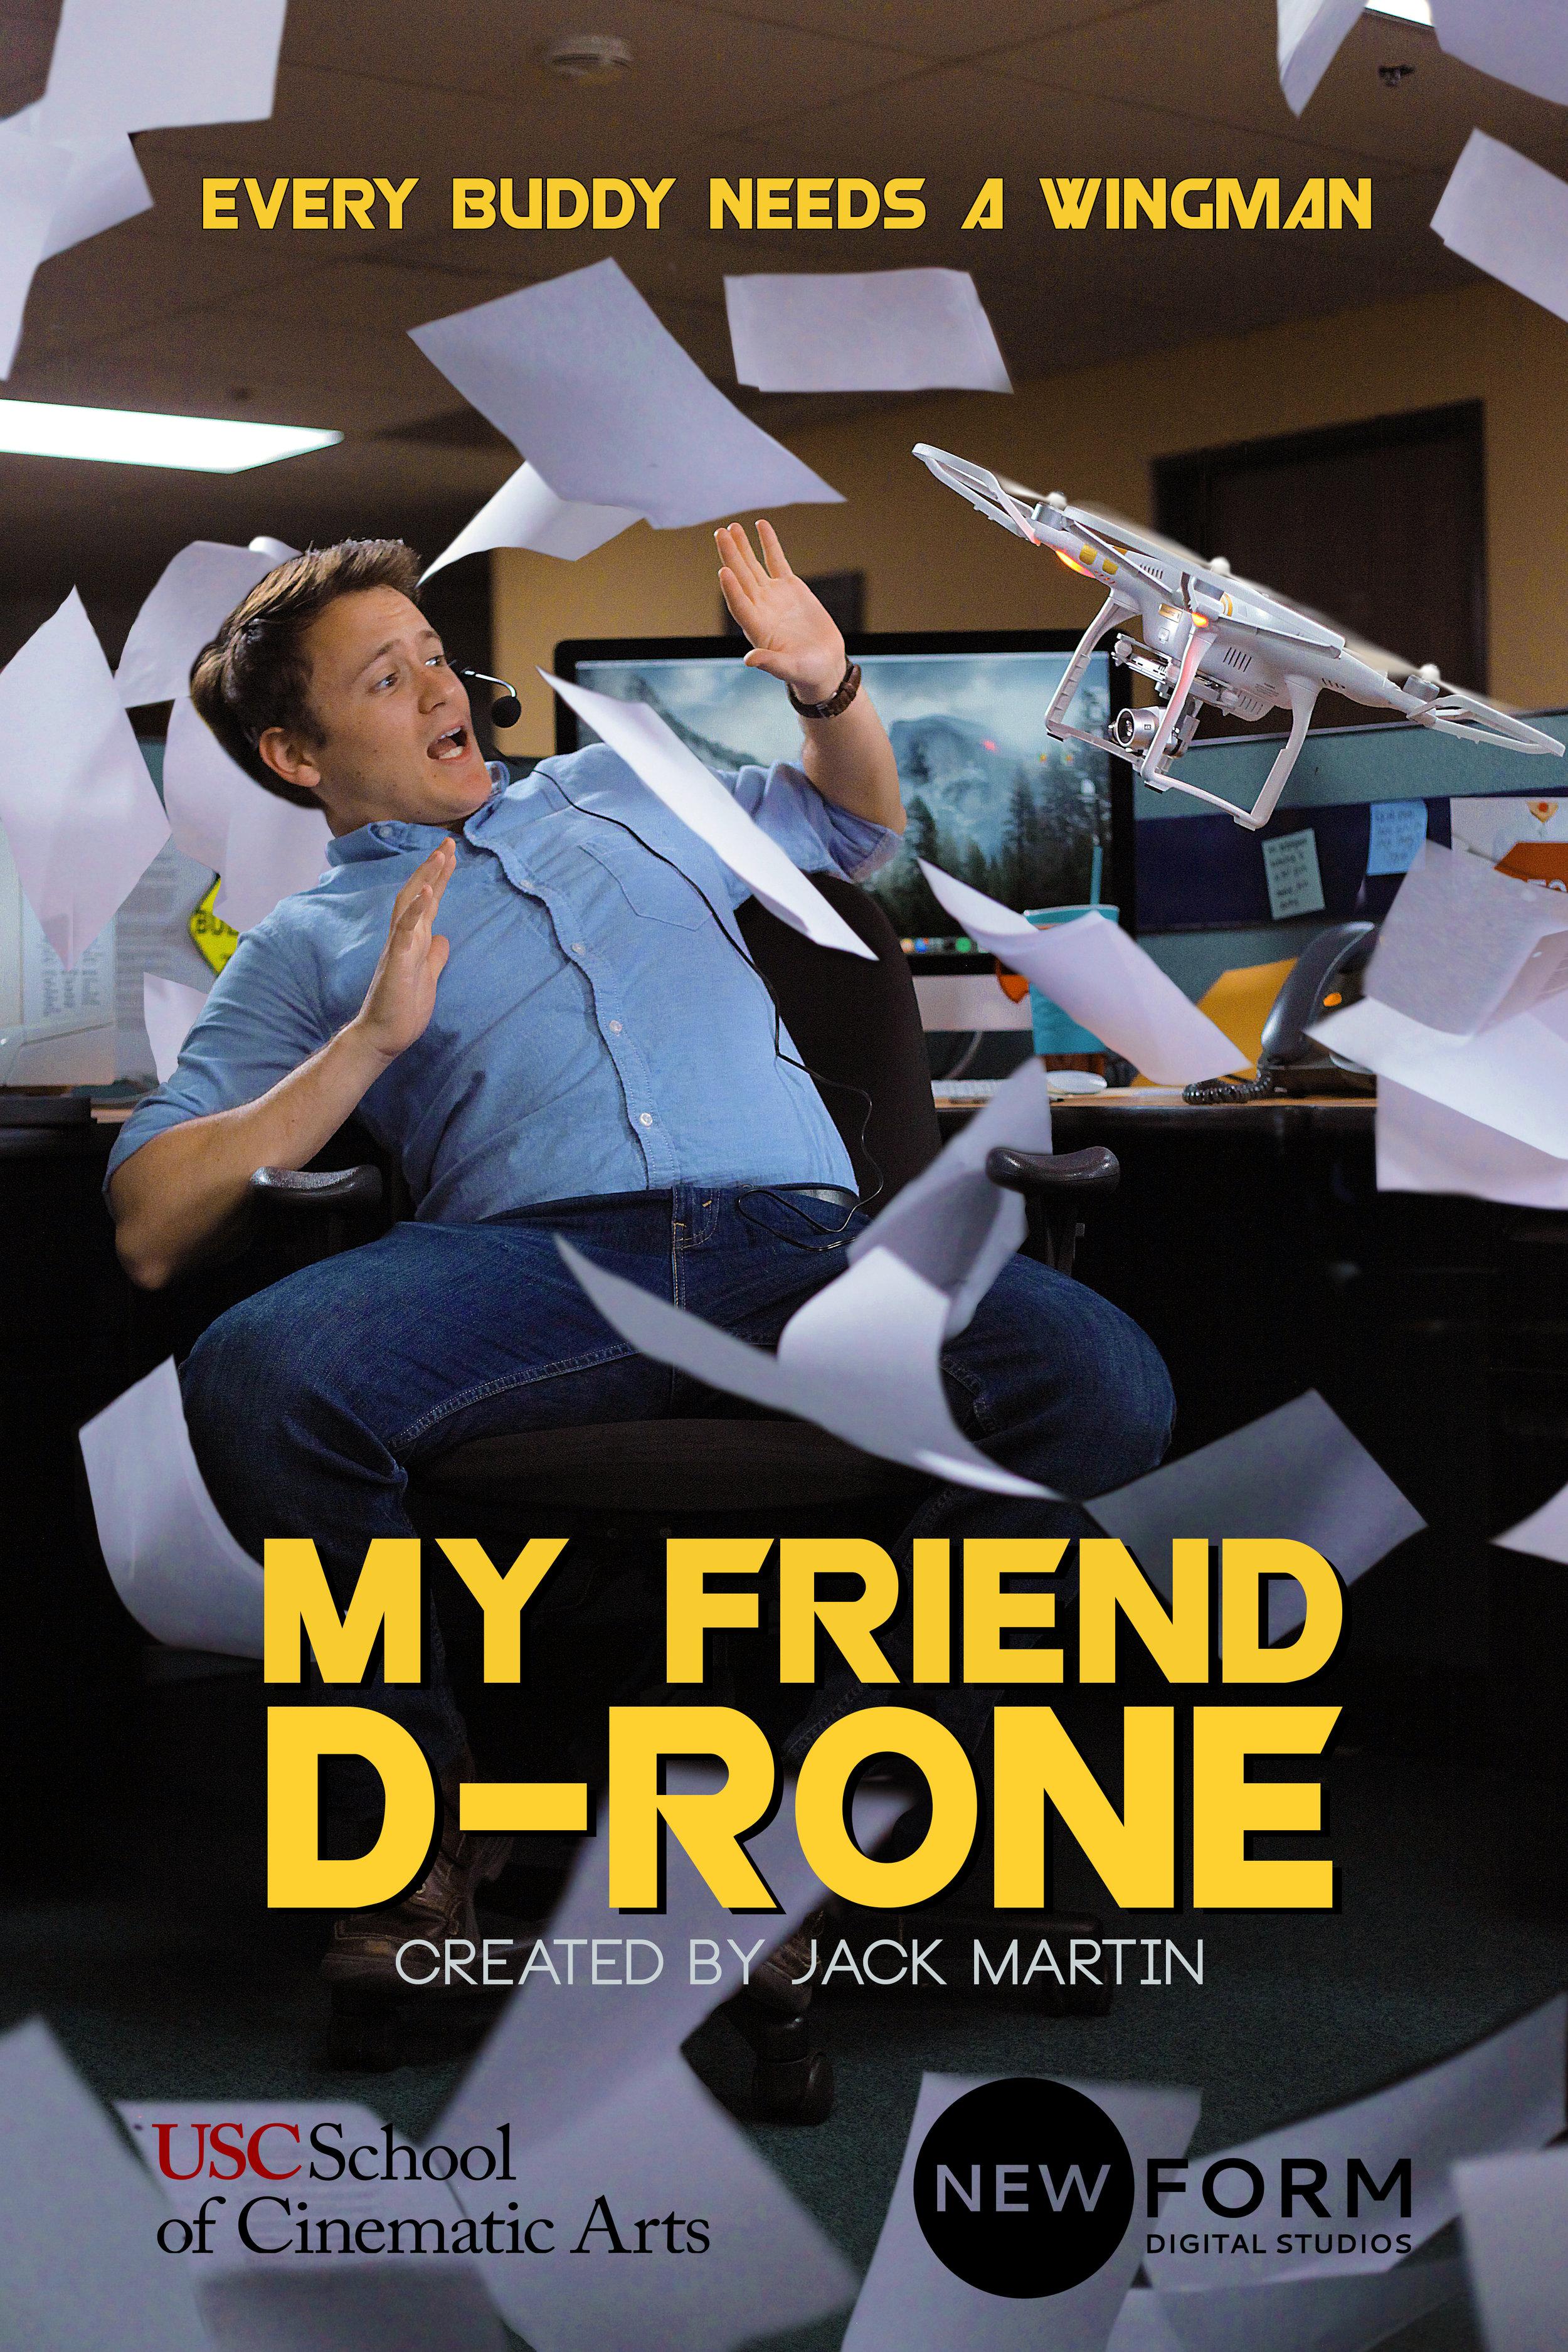 My Friend D-Rone